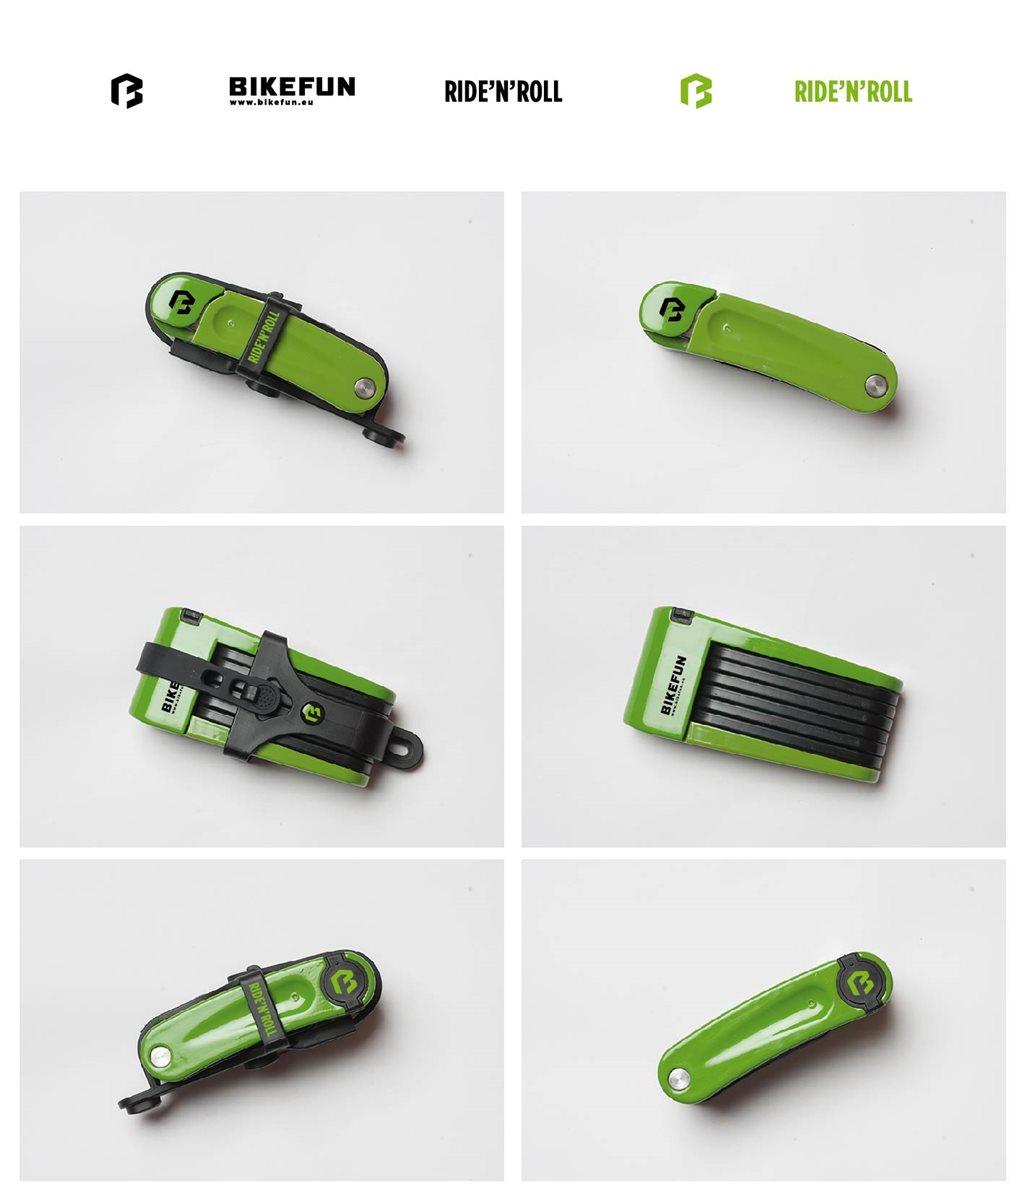 BikeFun-Lock-X1-logos-FULL.jpg Forrás: Bikefun